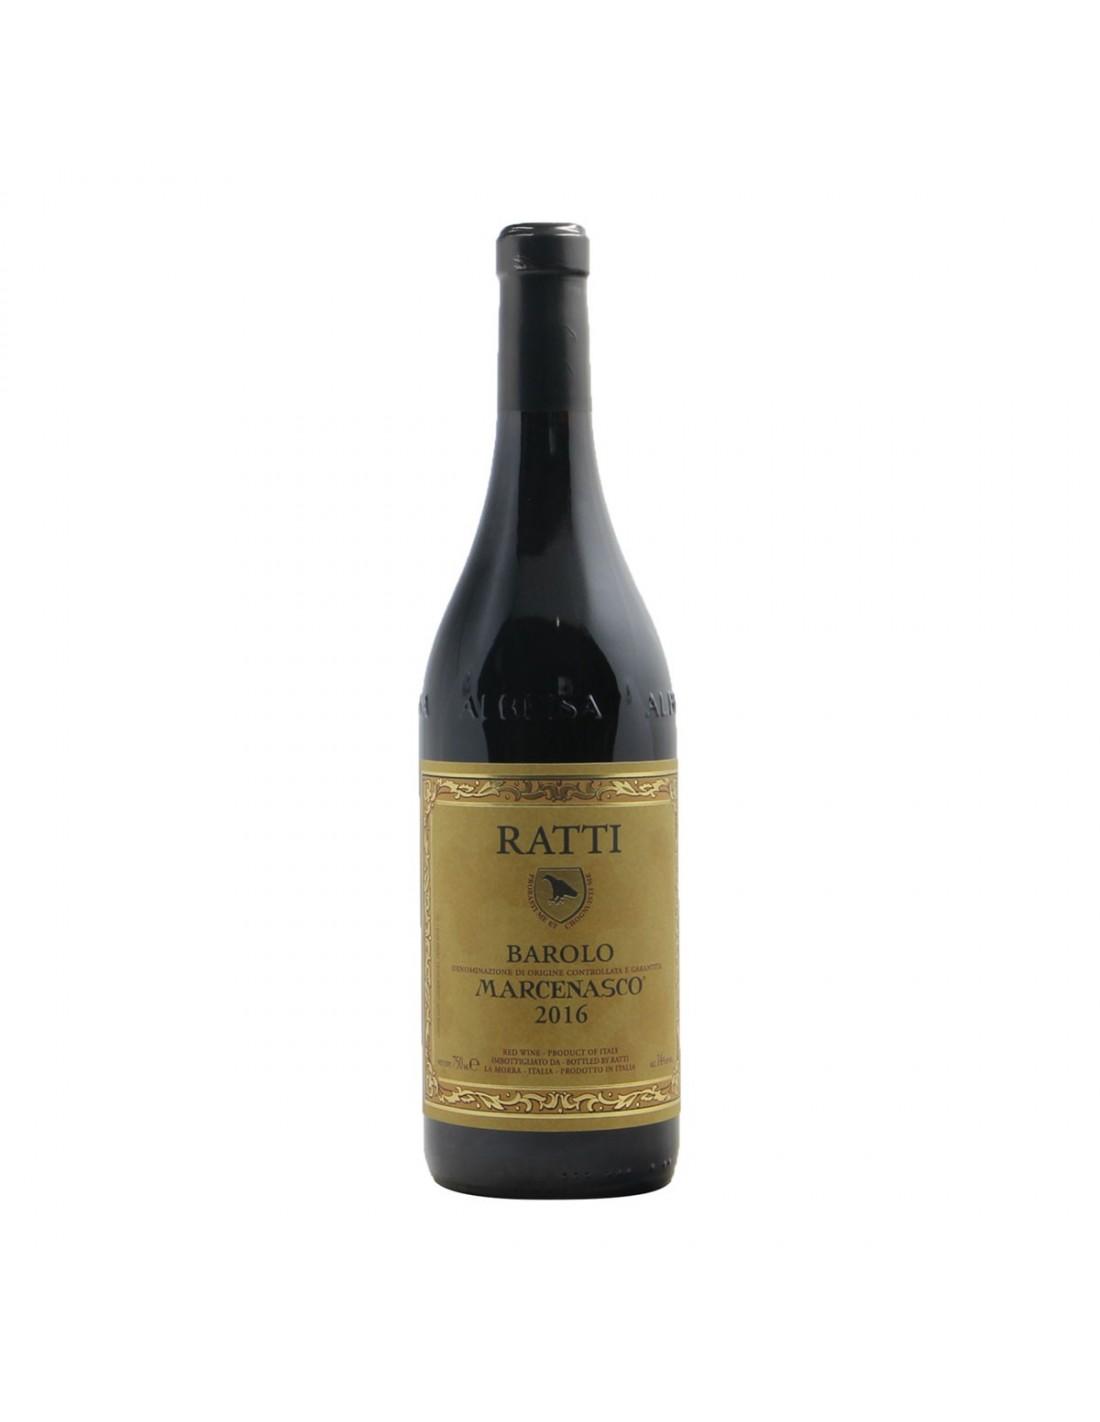 BAROLO MARCENASCO 2016 RATTI Grandi Bottiglie